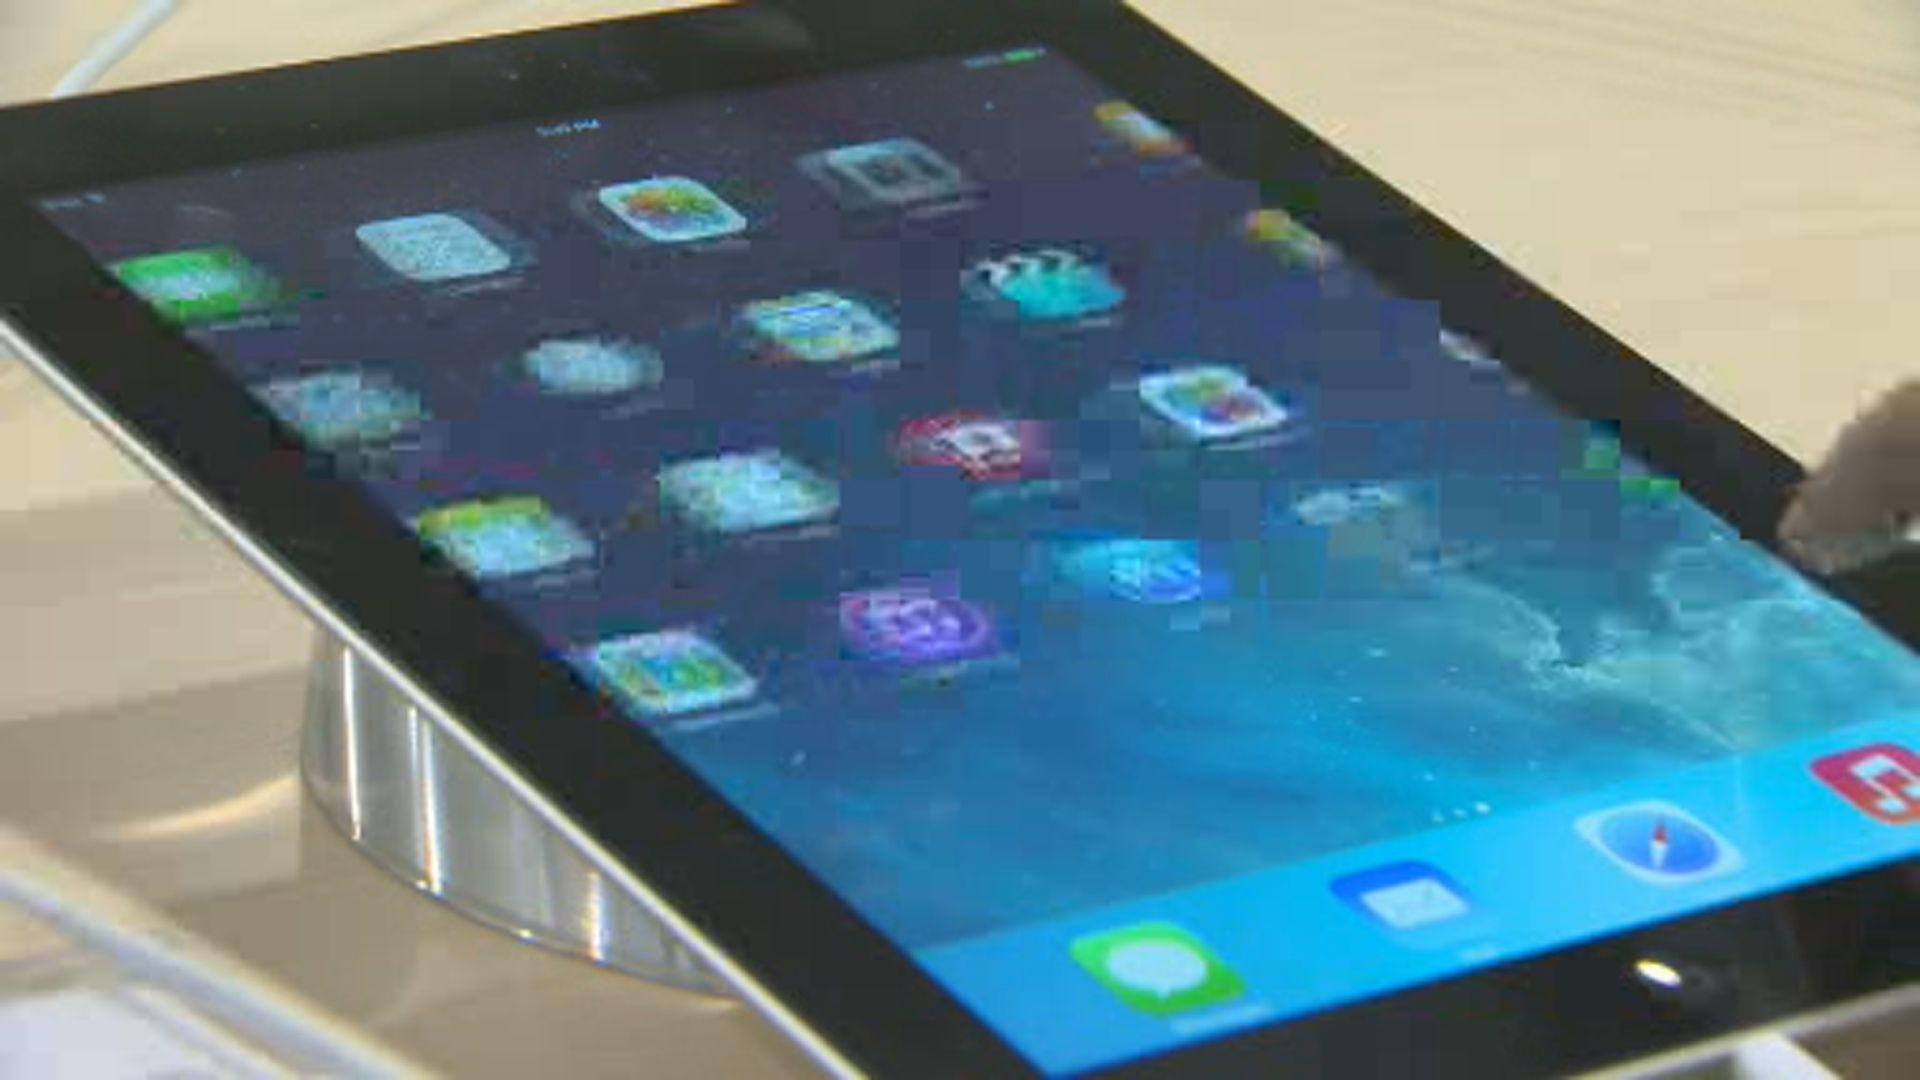 Apple unveils latest iPhones, Apple Watch